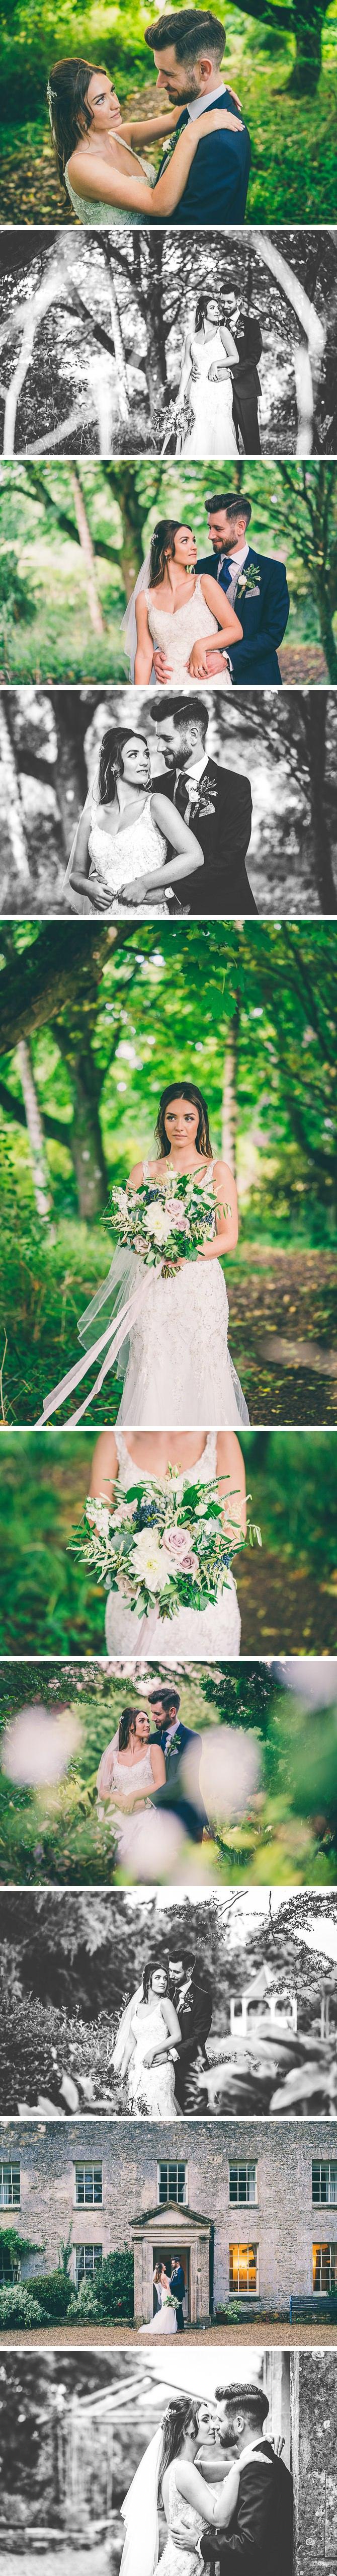 Bridal Photos at the Great Tythe Barn